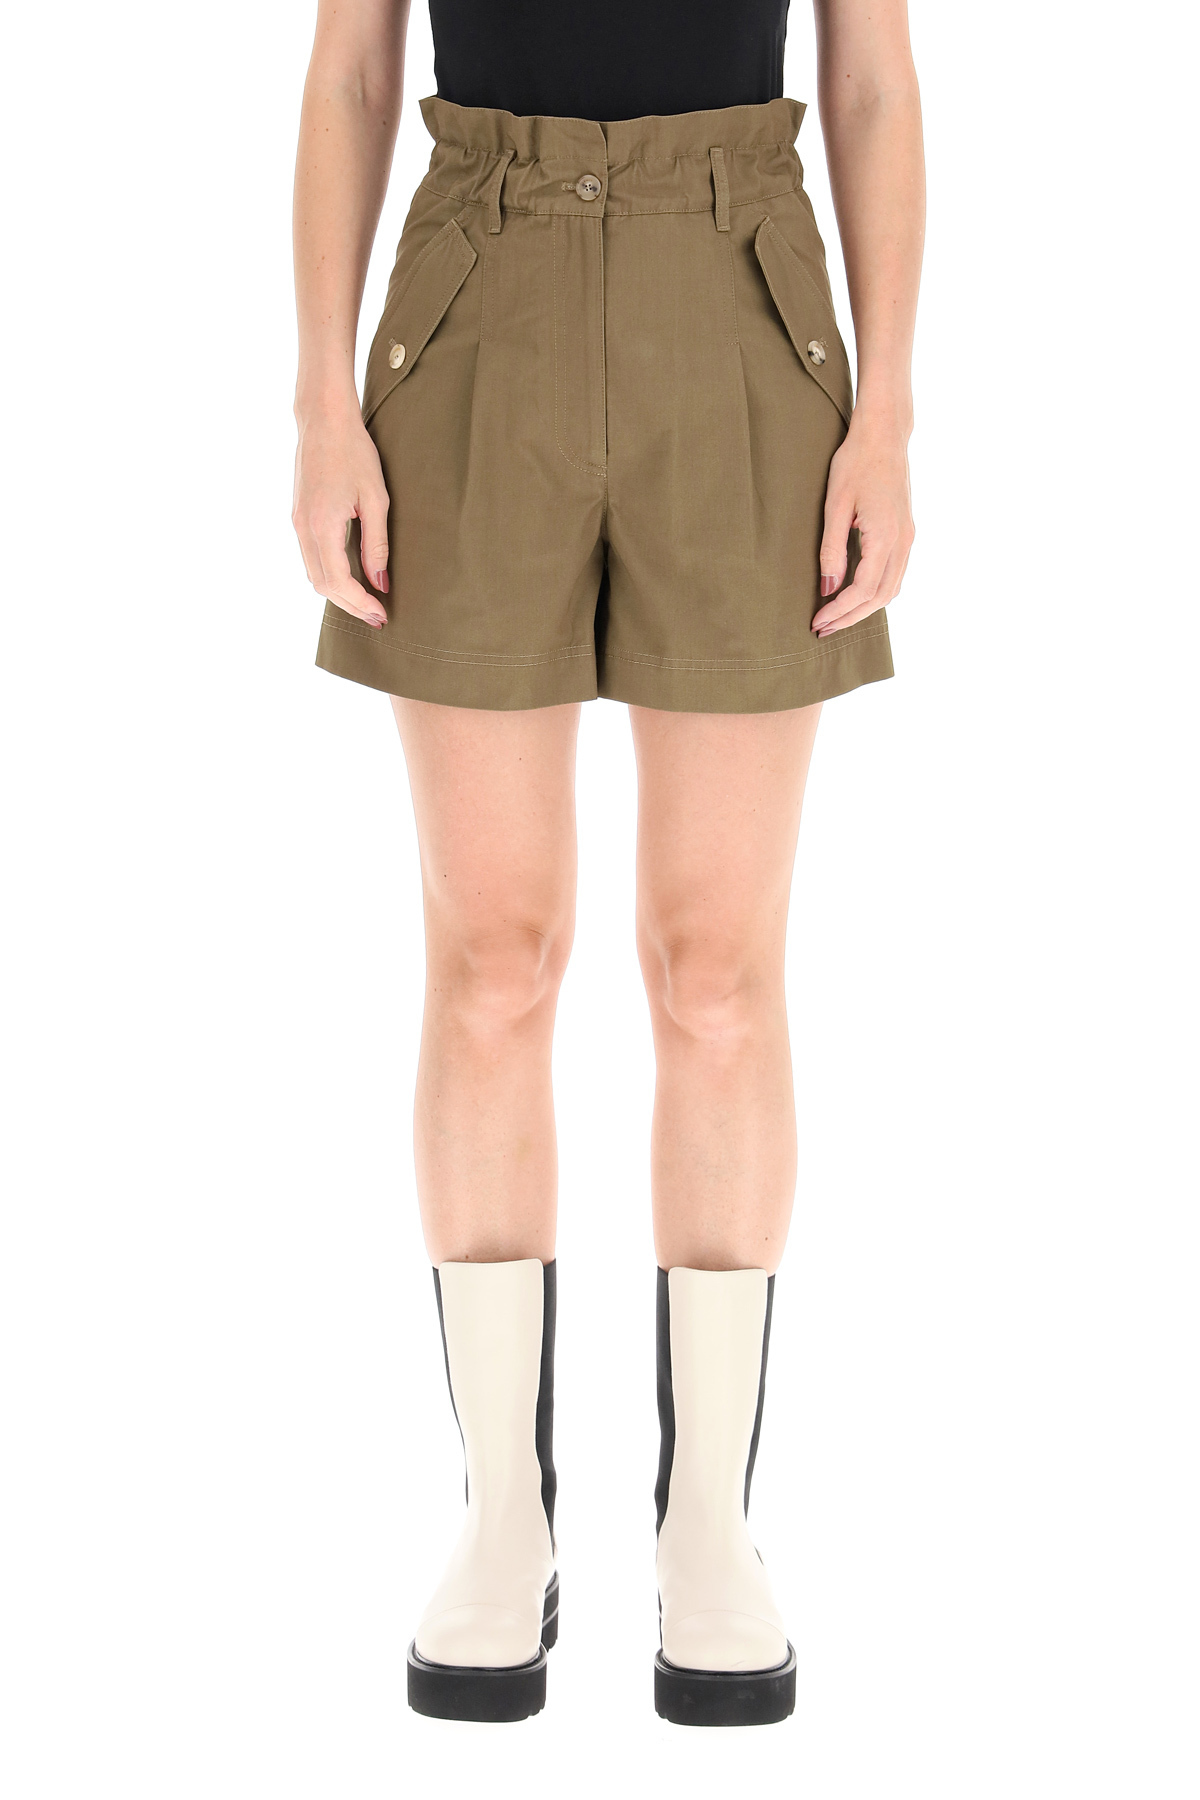 Kenzo pantaloncino in cotone